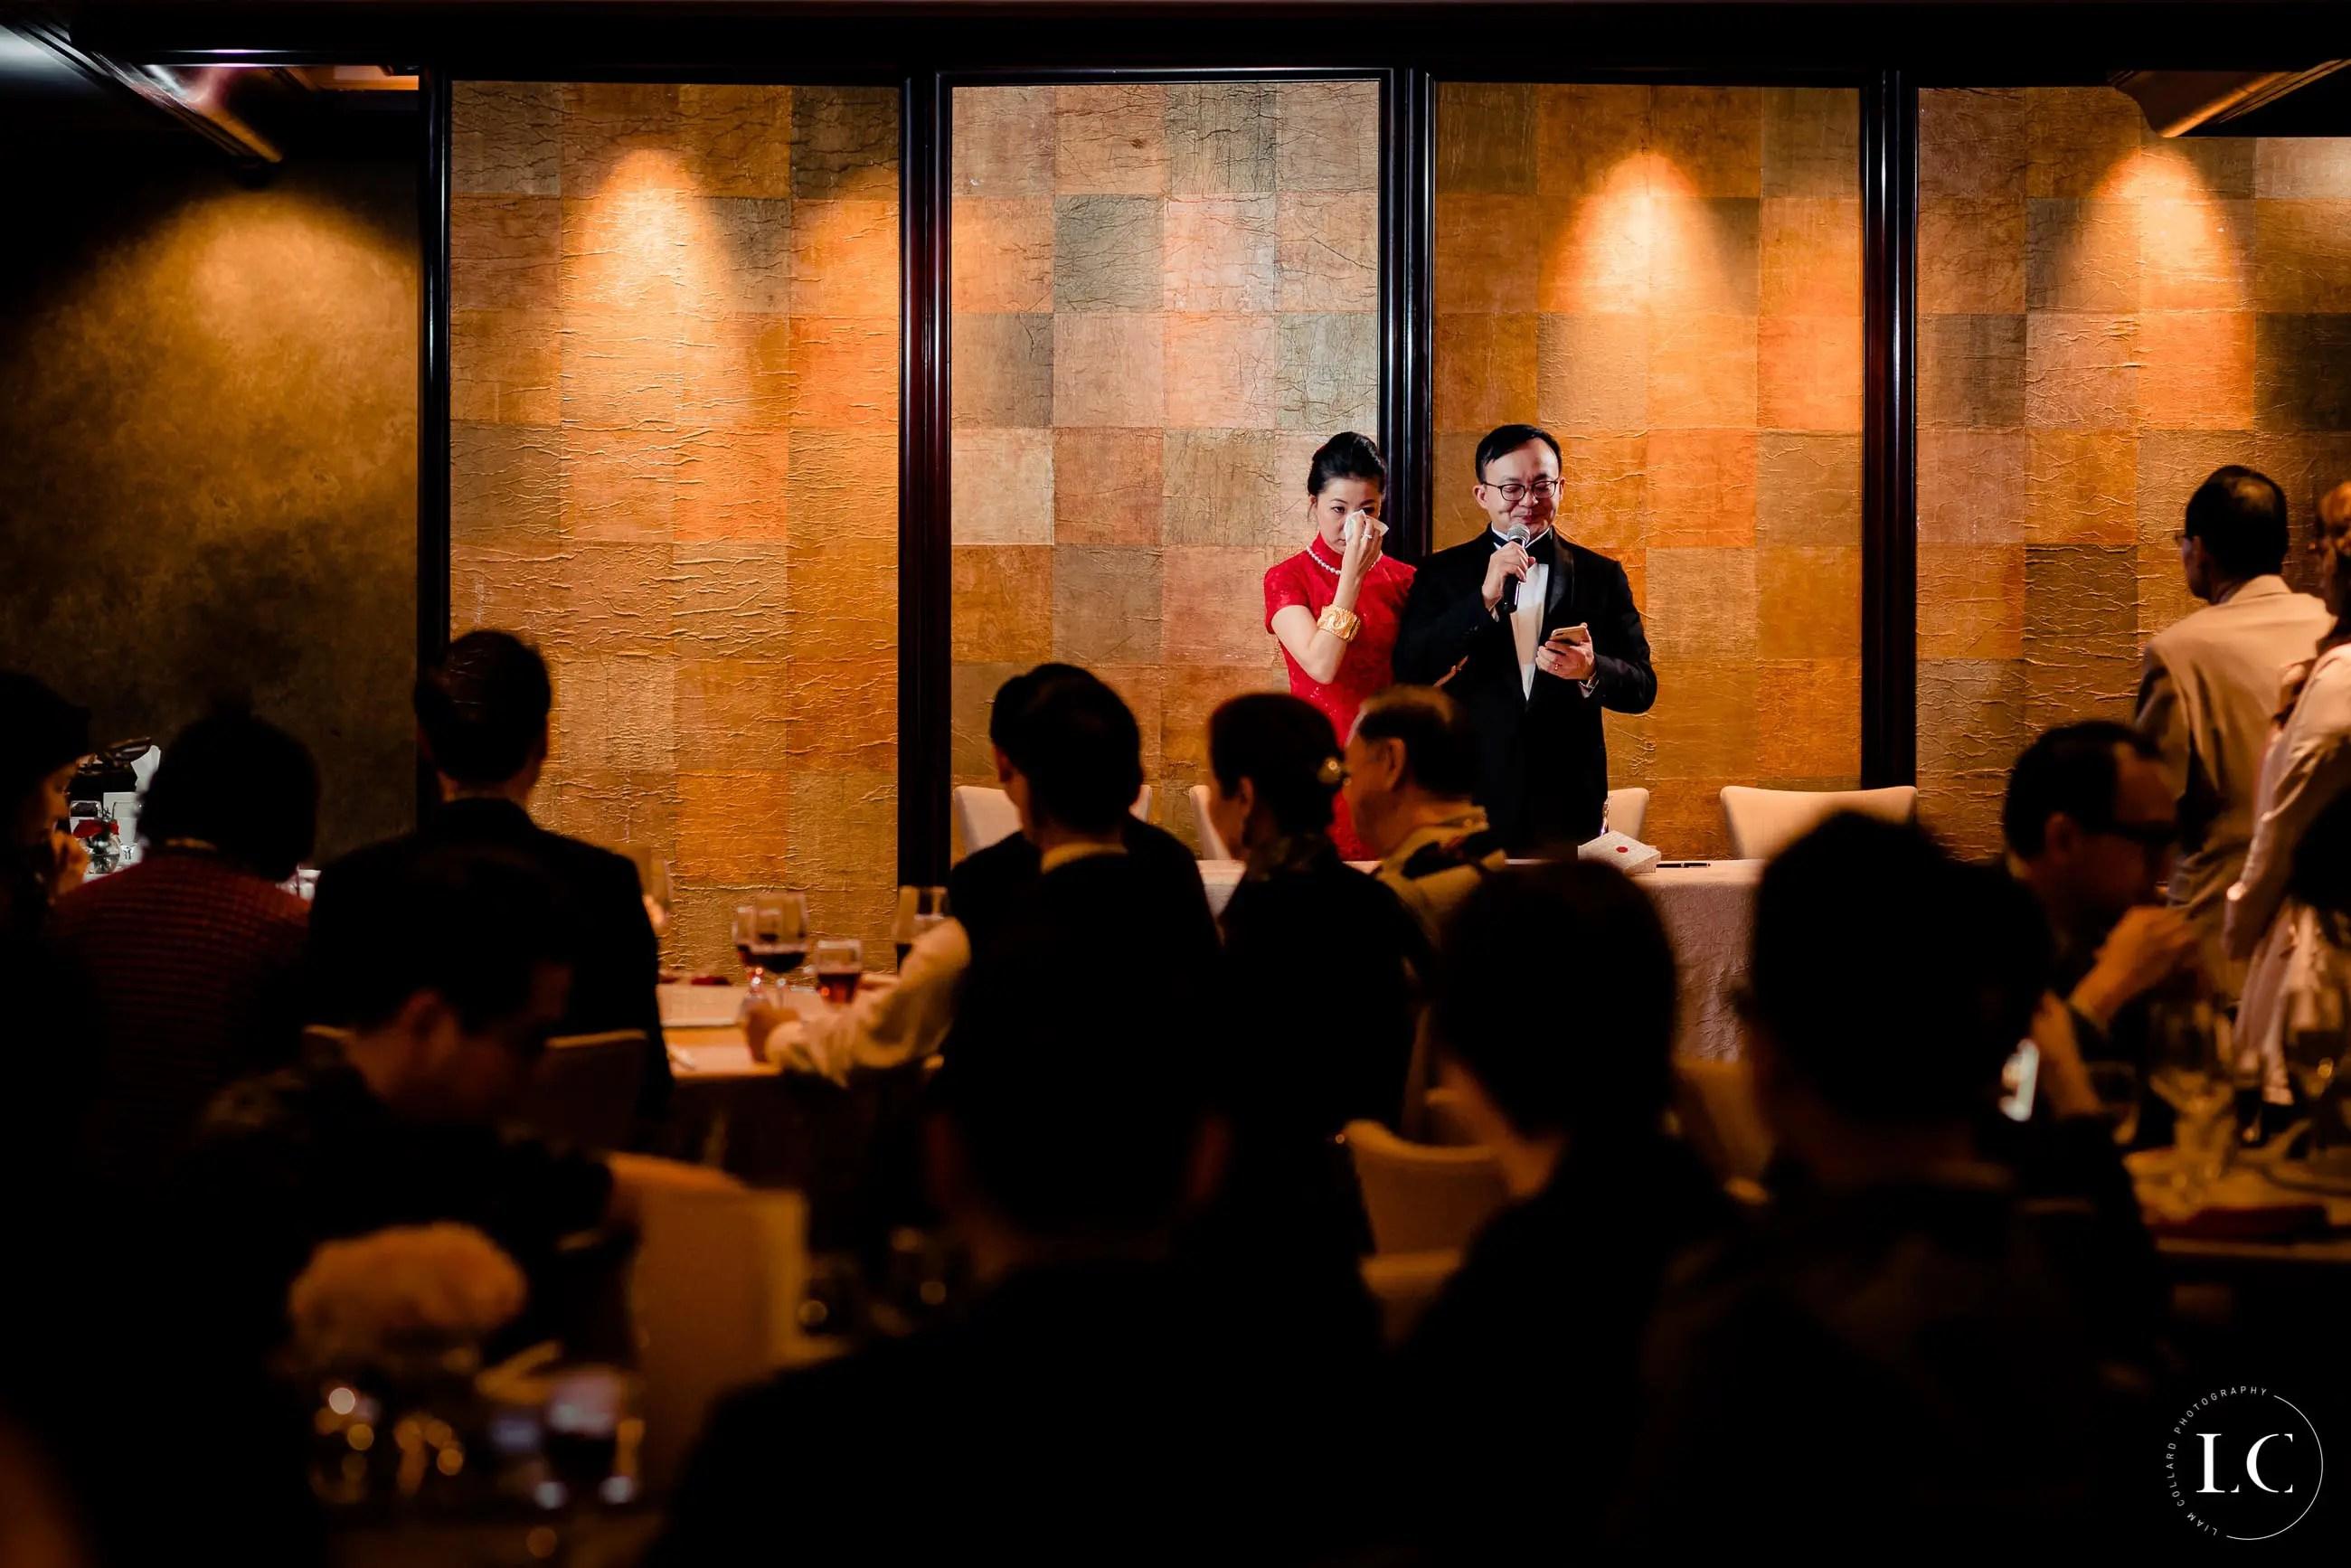 Speeches at a wedding